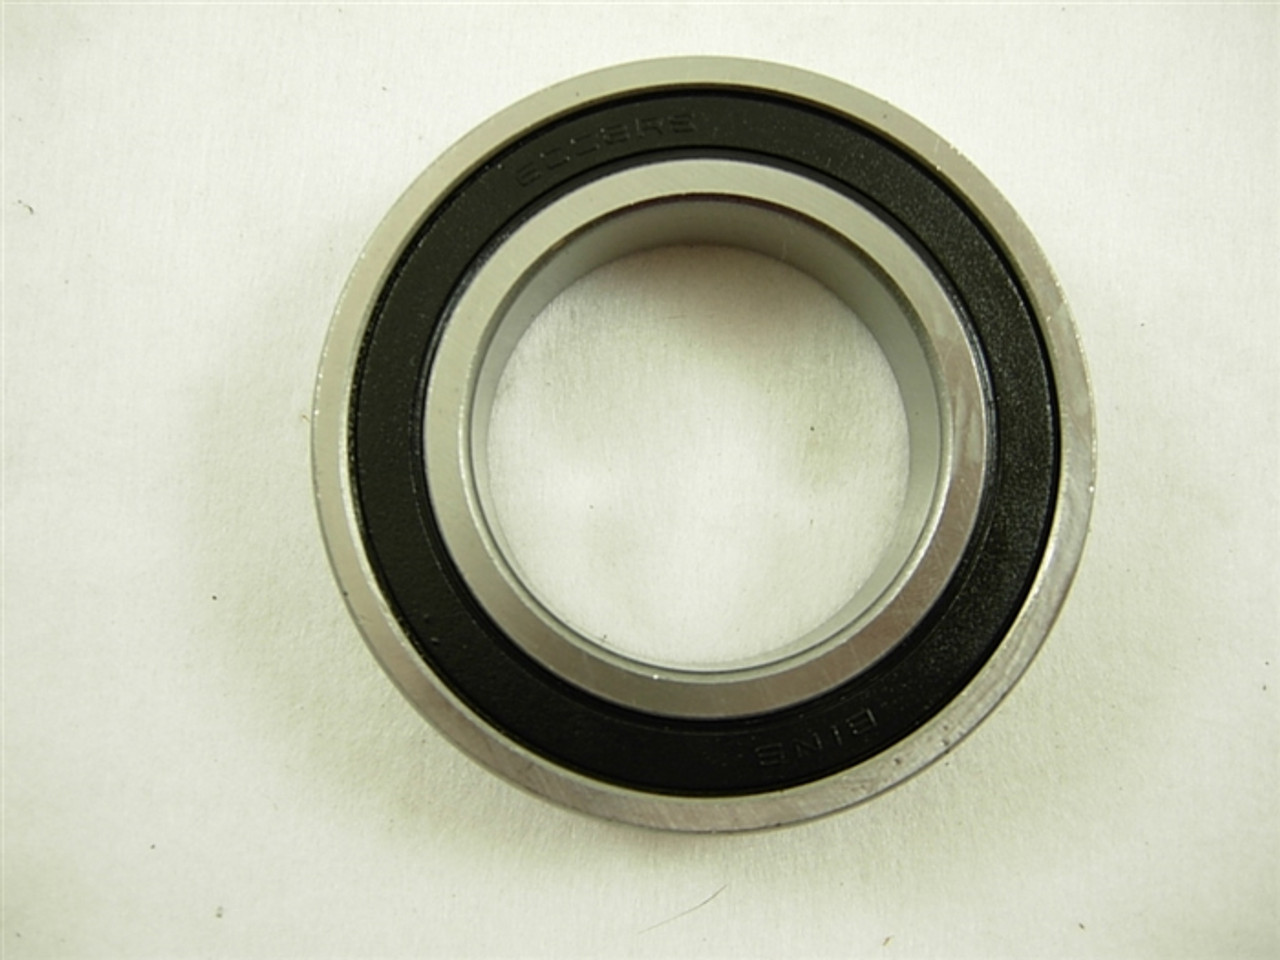 bearing 10547-a31-7